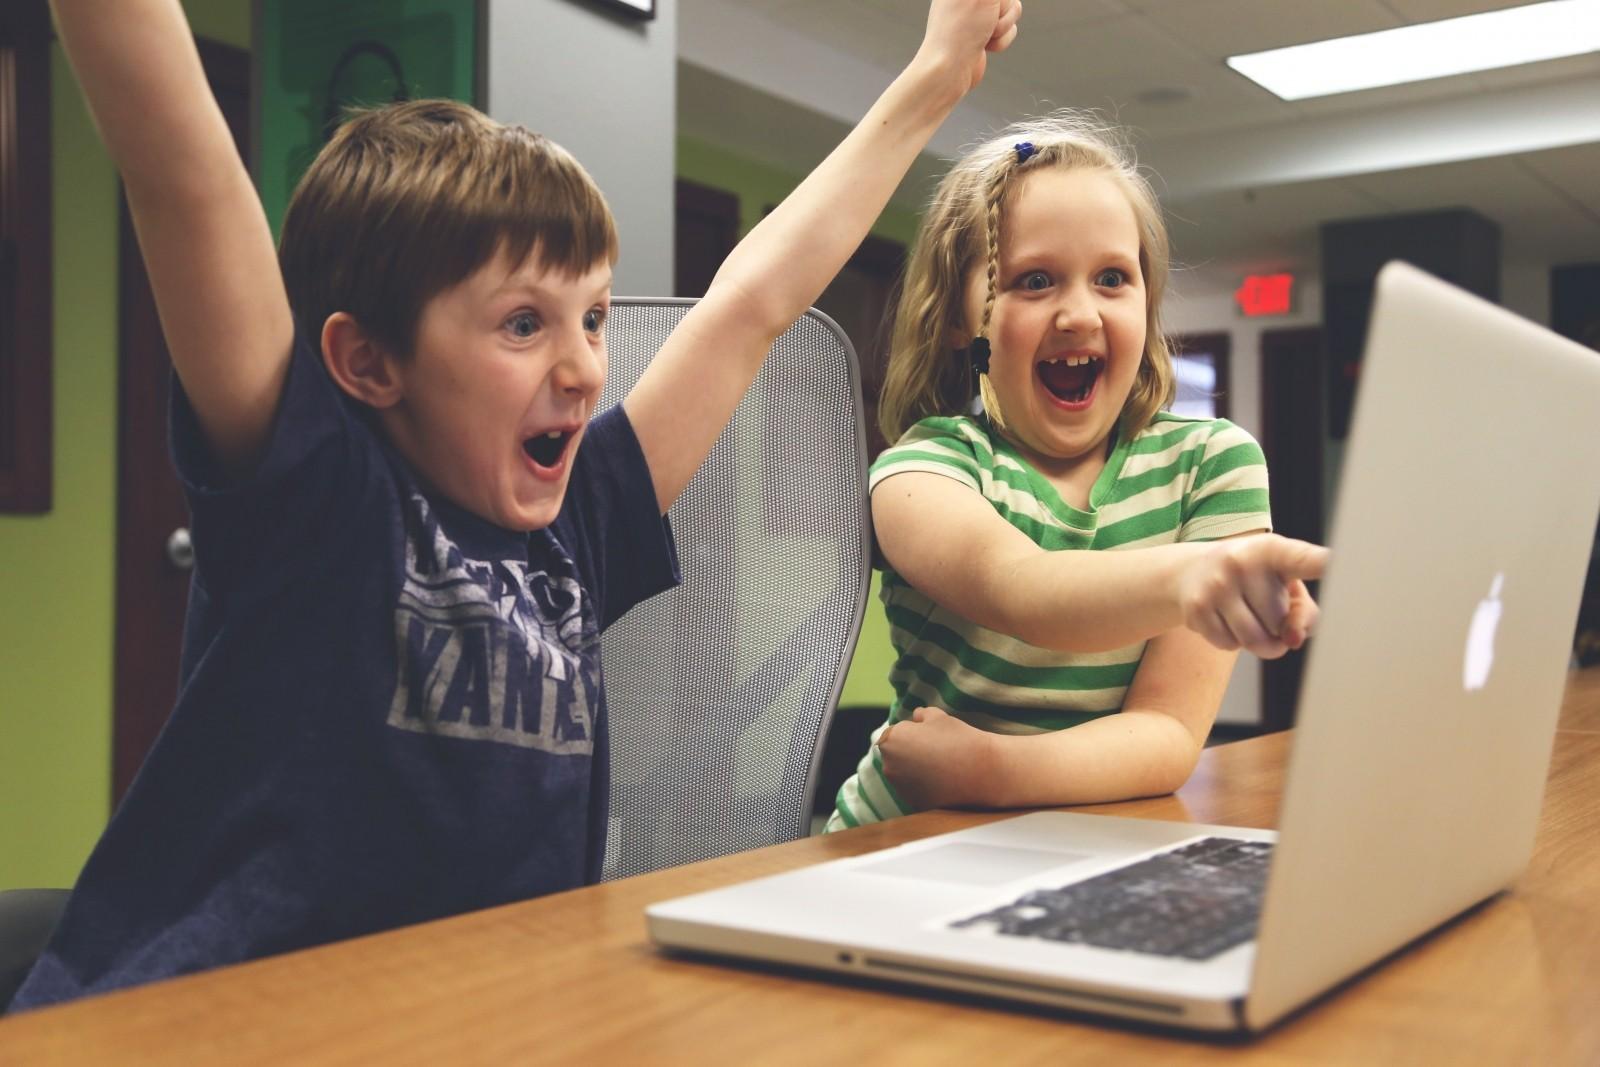 Enthusiastic children playing on computer, Foto: freerangestock.com